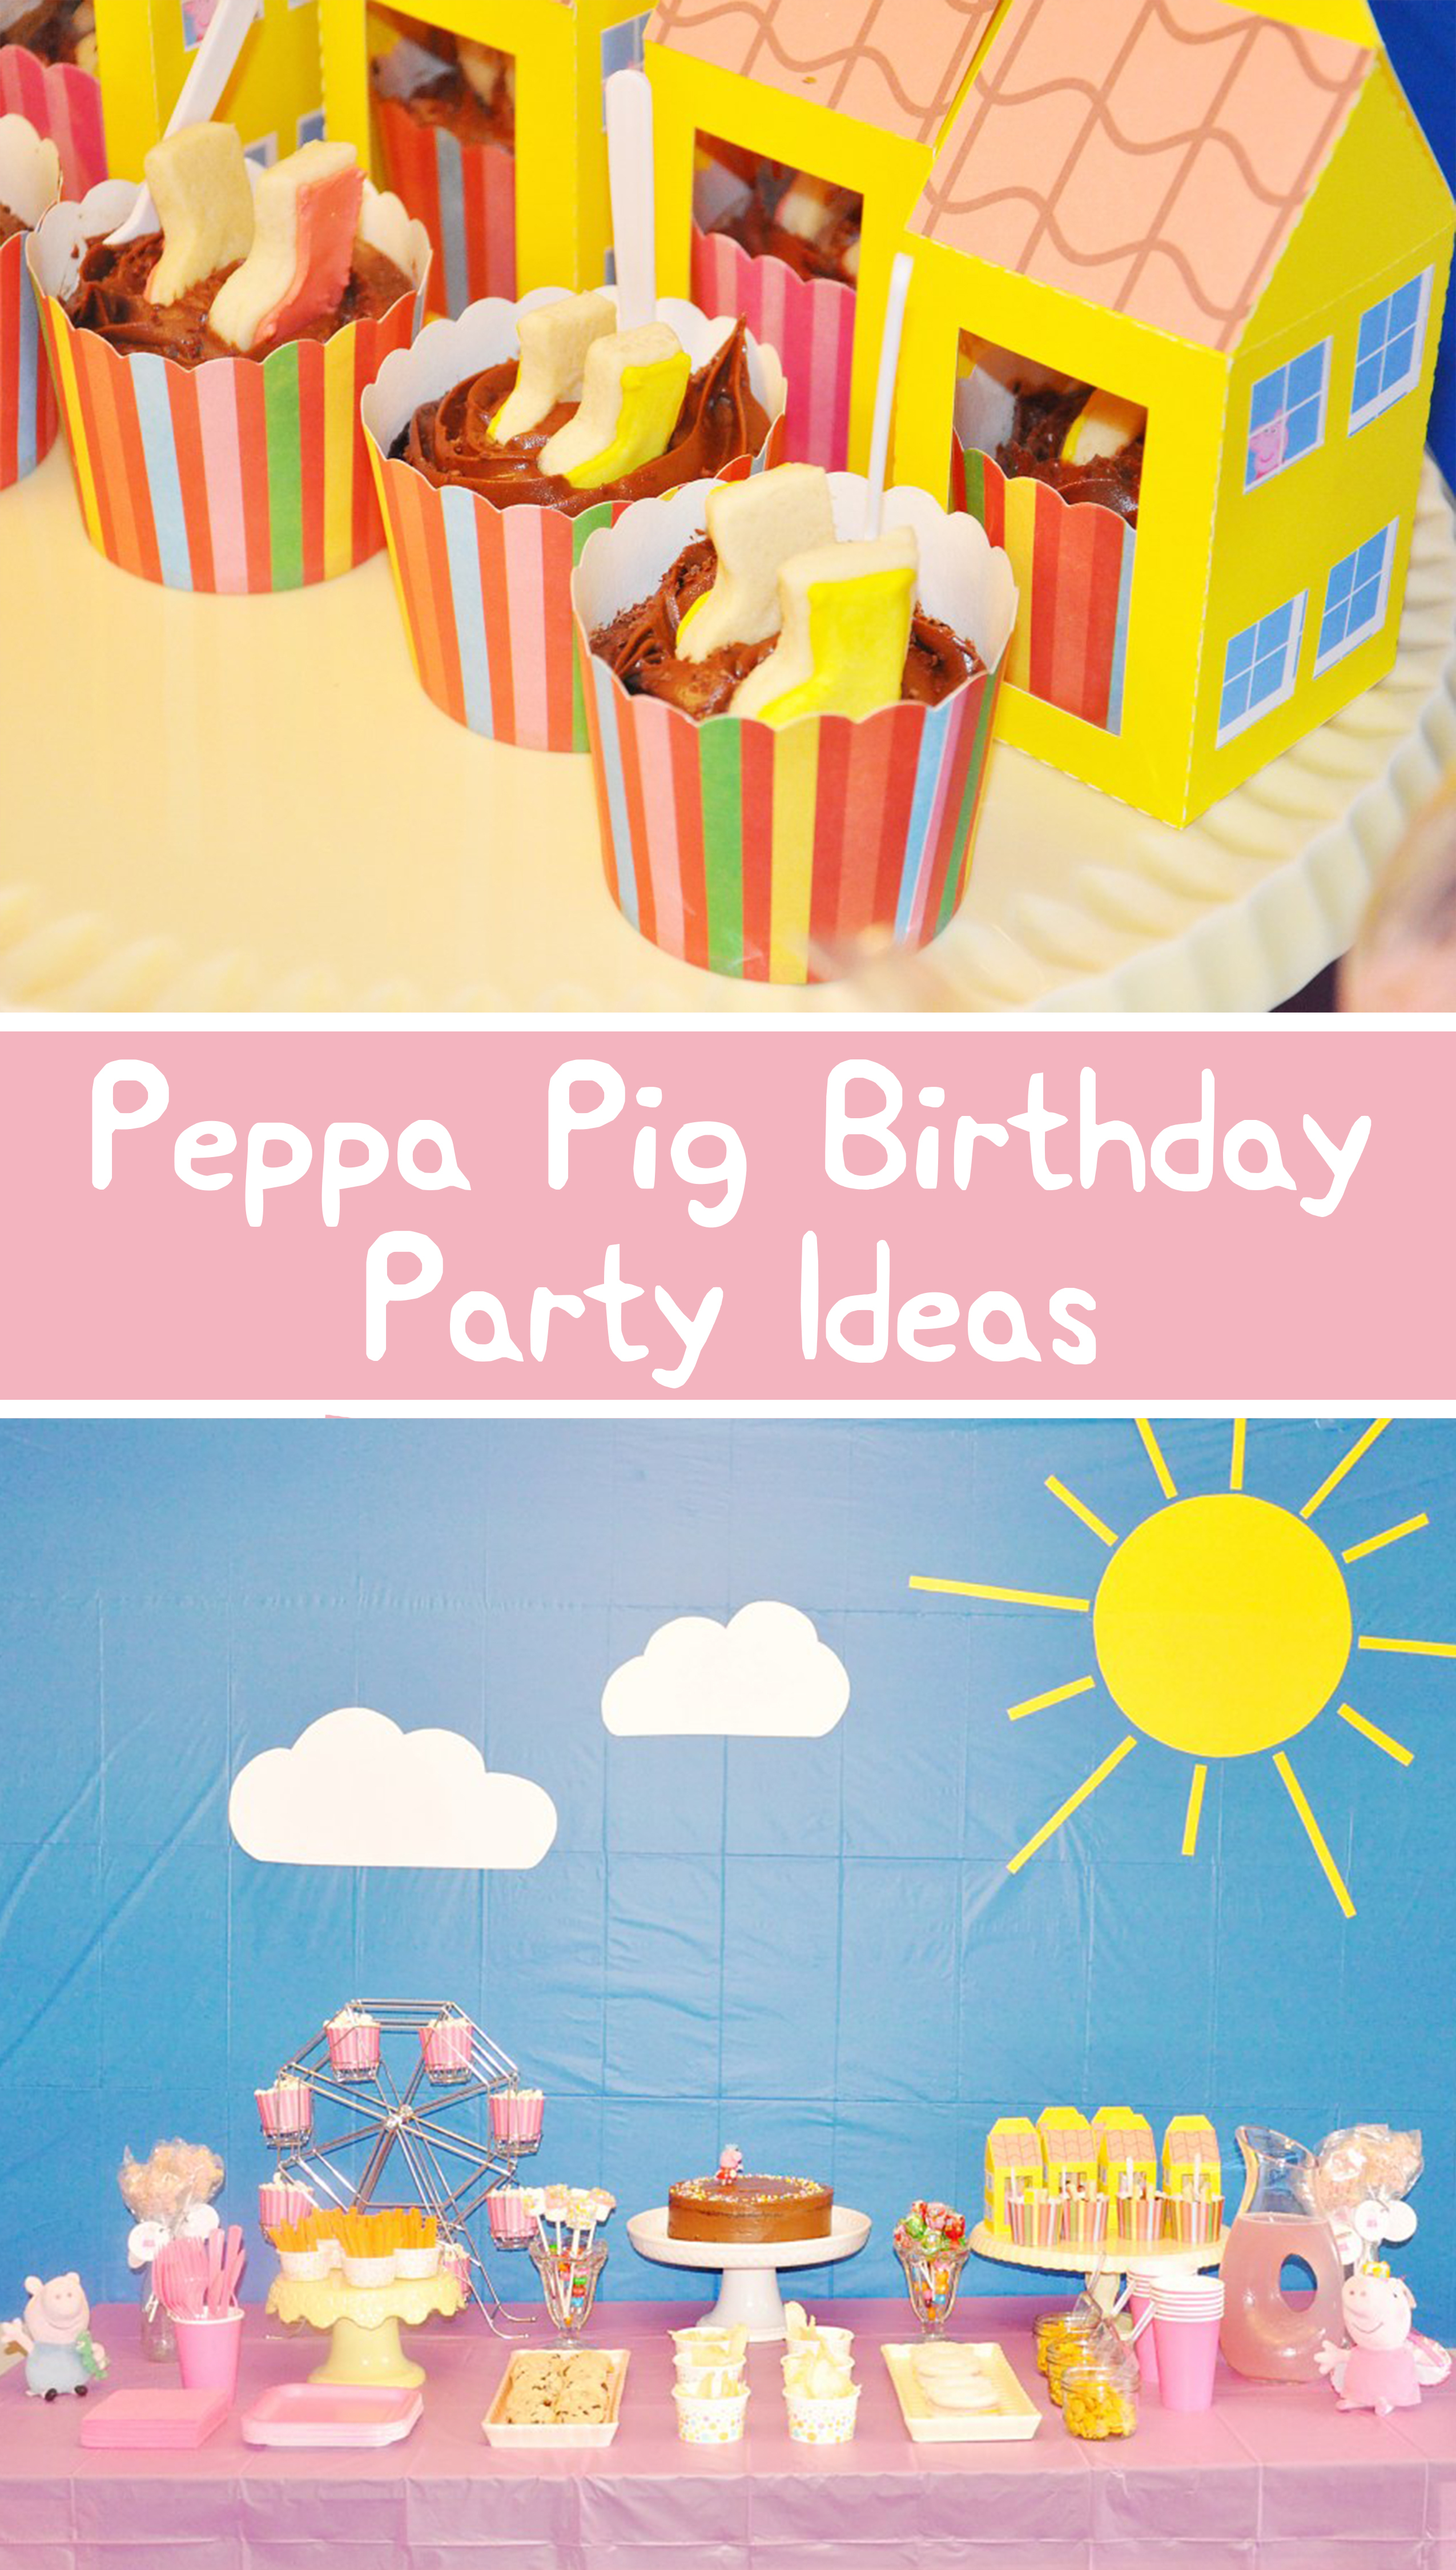 Peppa Pig Birthday Party! (Simple Diy Ideas & Free Printables - Peppa Pig Free Printables